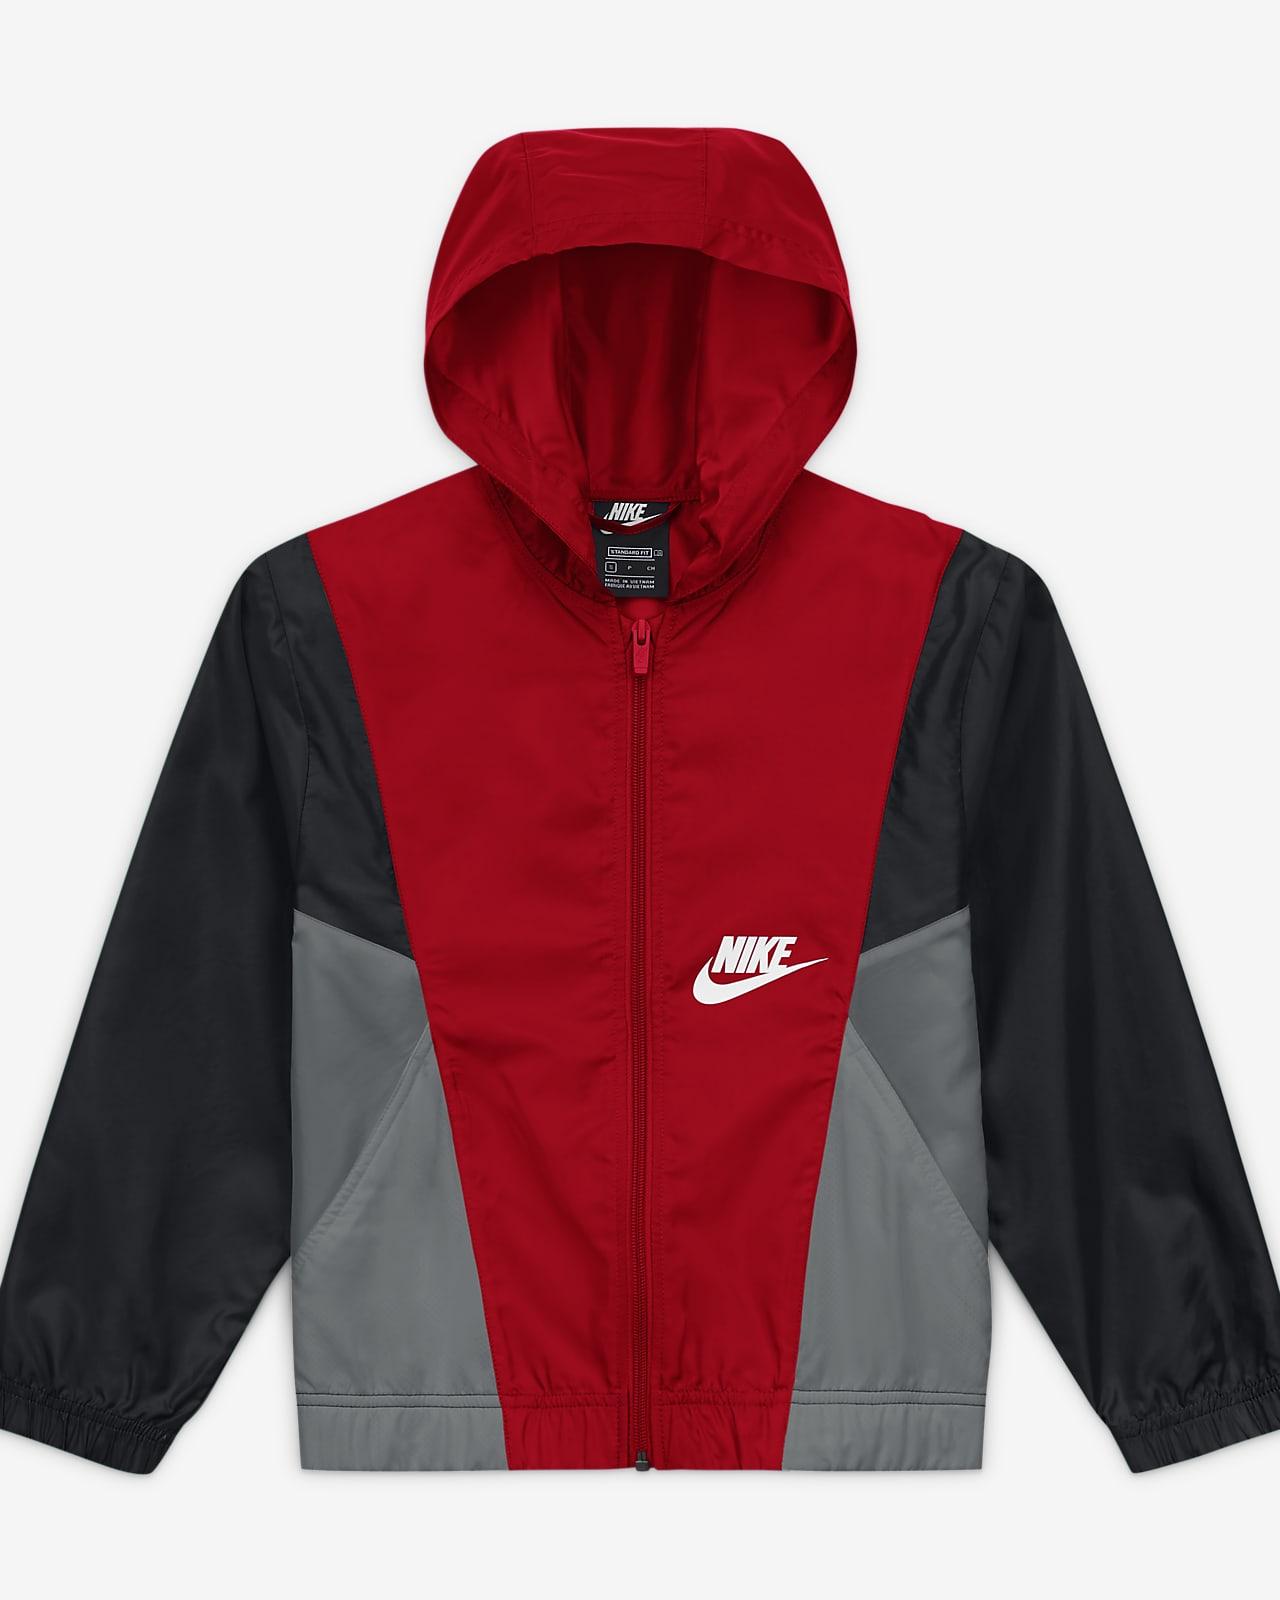 Куртка из тканого материала для мальчиков школьного возраста Nike Sportswear